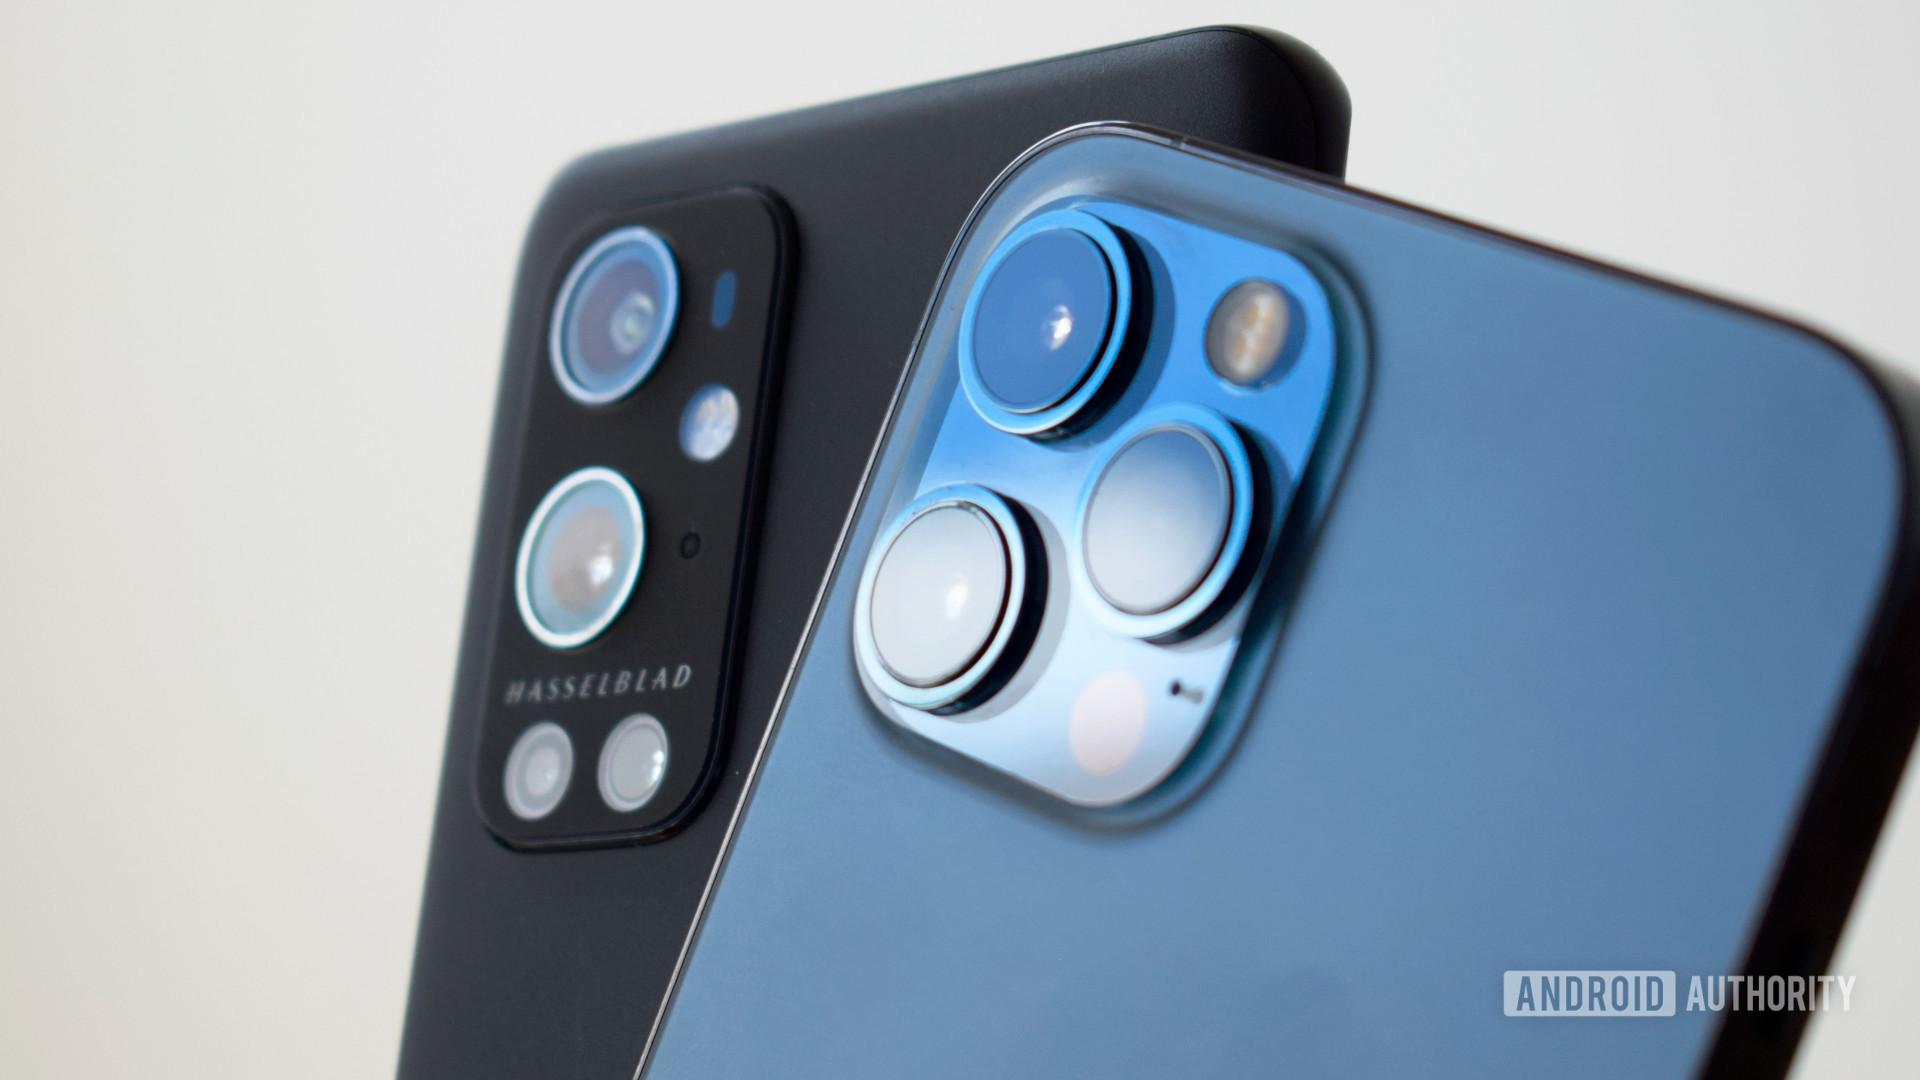 OnePlus 9 Pro vs Apple iPhone 12 Pro Max cameras bright